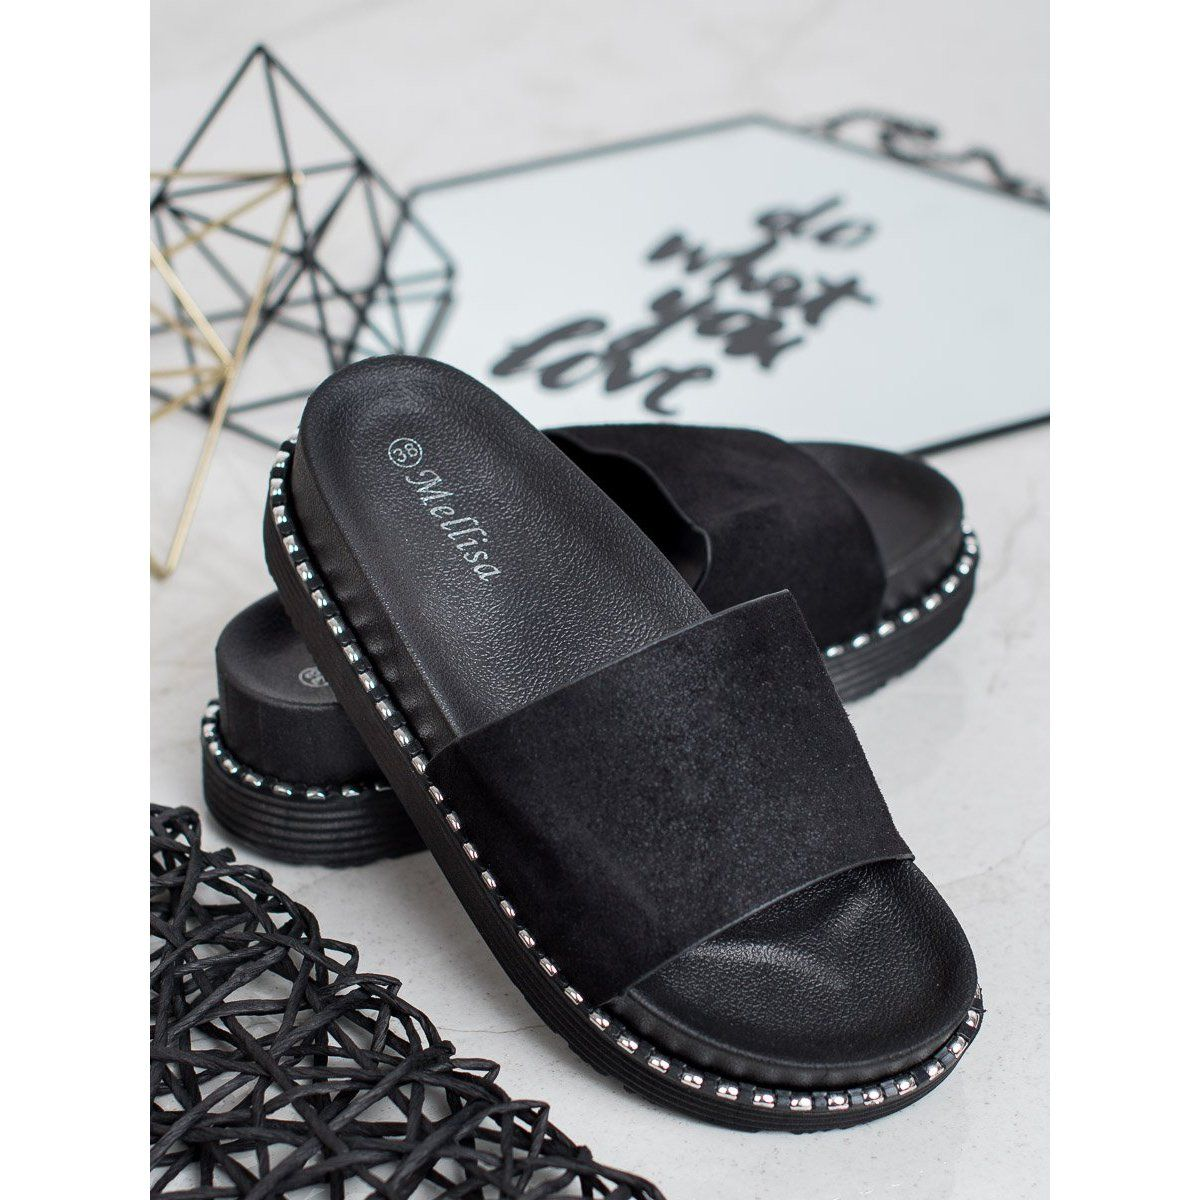 Melisa Klapki Na Koturnie Czarne Shoes Clogs Dansko Professional Clog